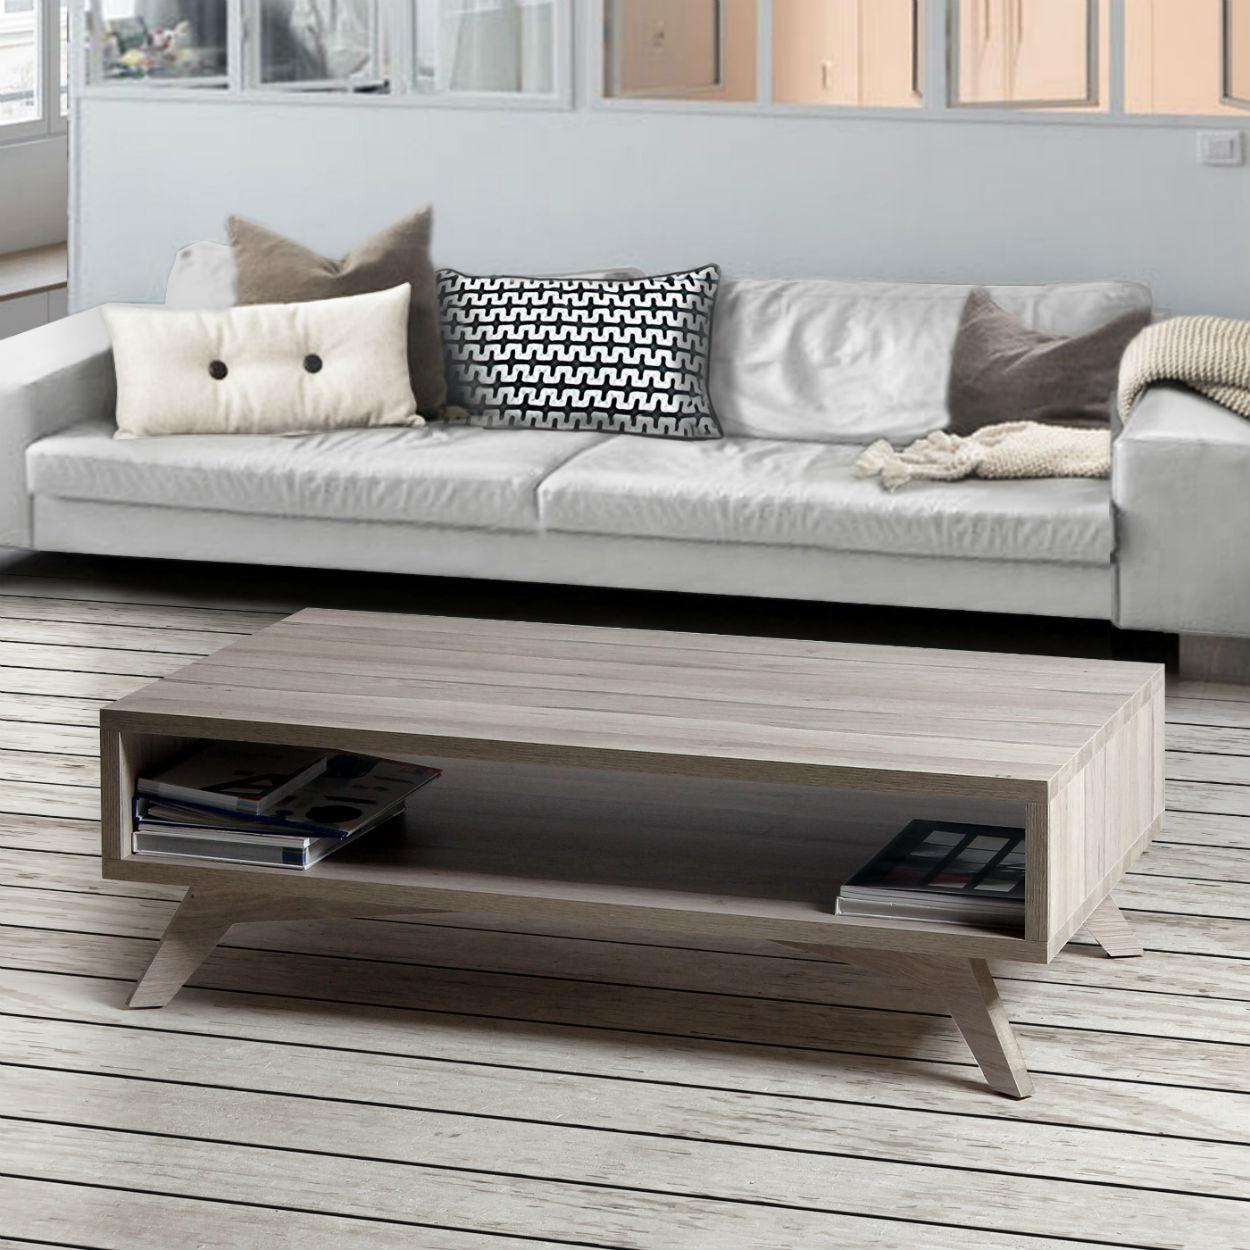 Table basse de salon scandinave